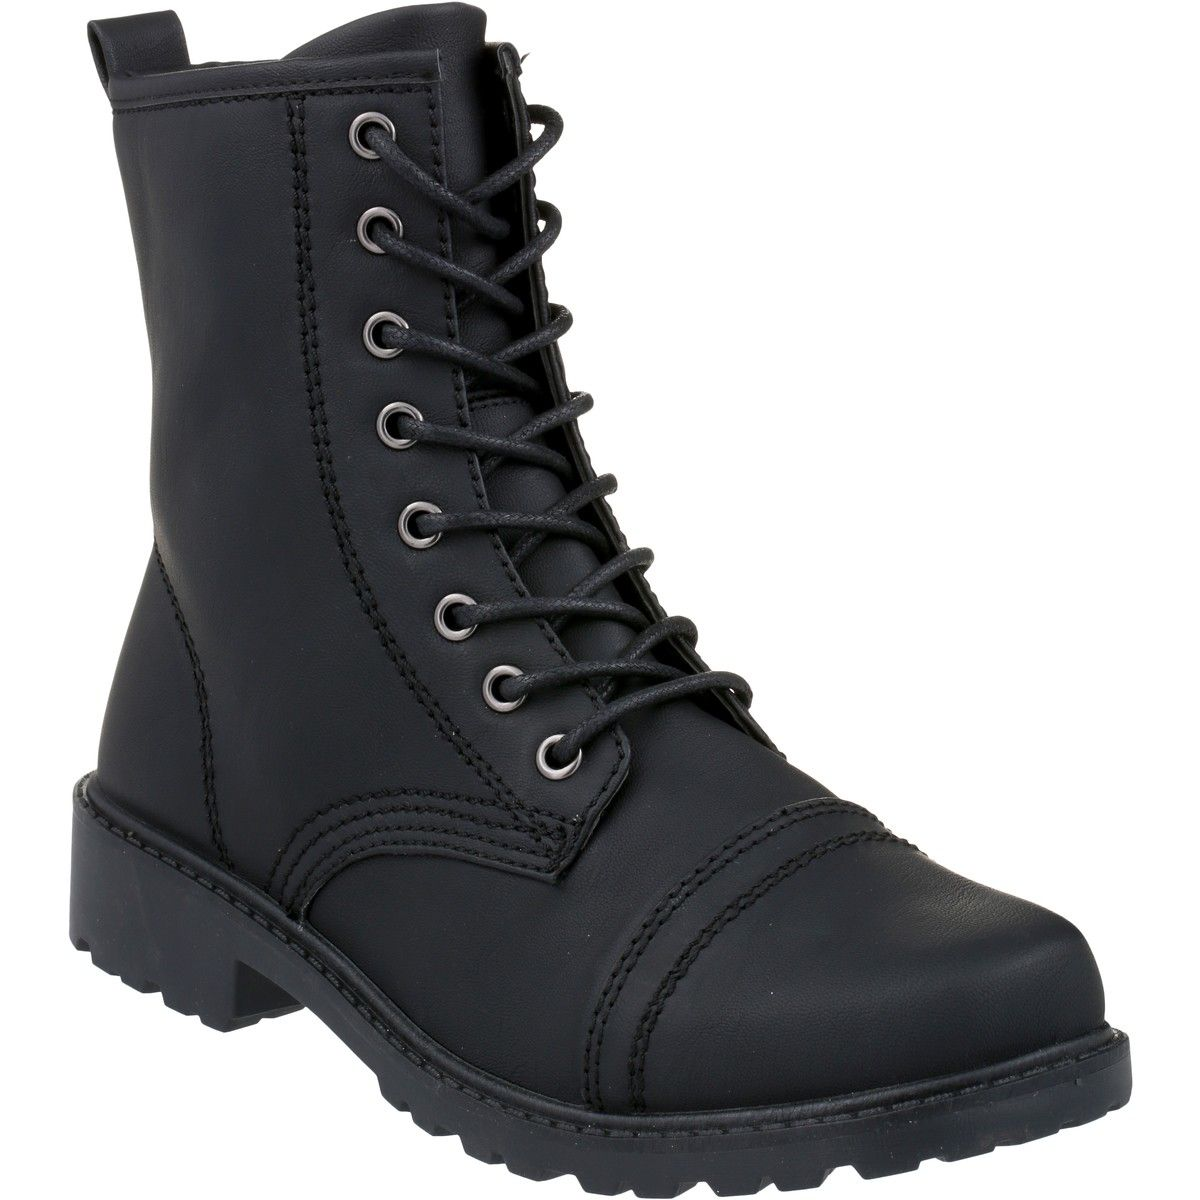 Brilliant Basics Women's Military Boots